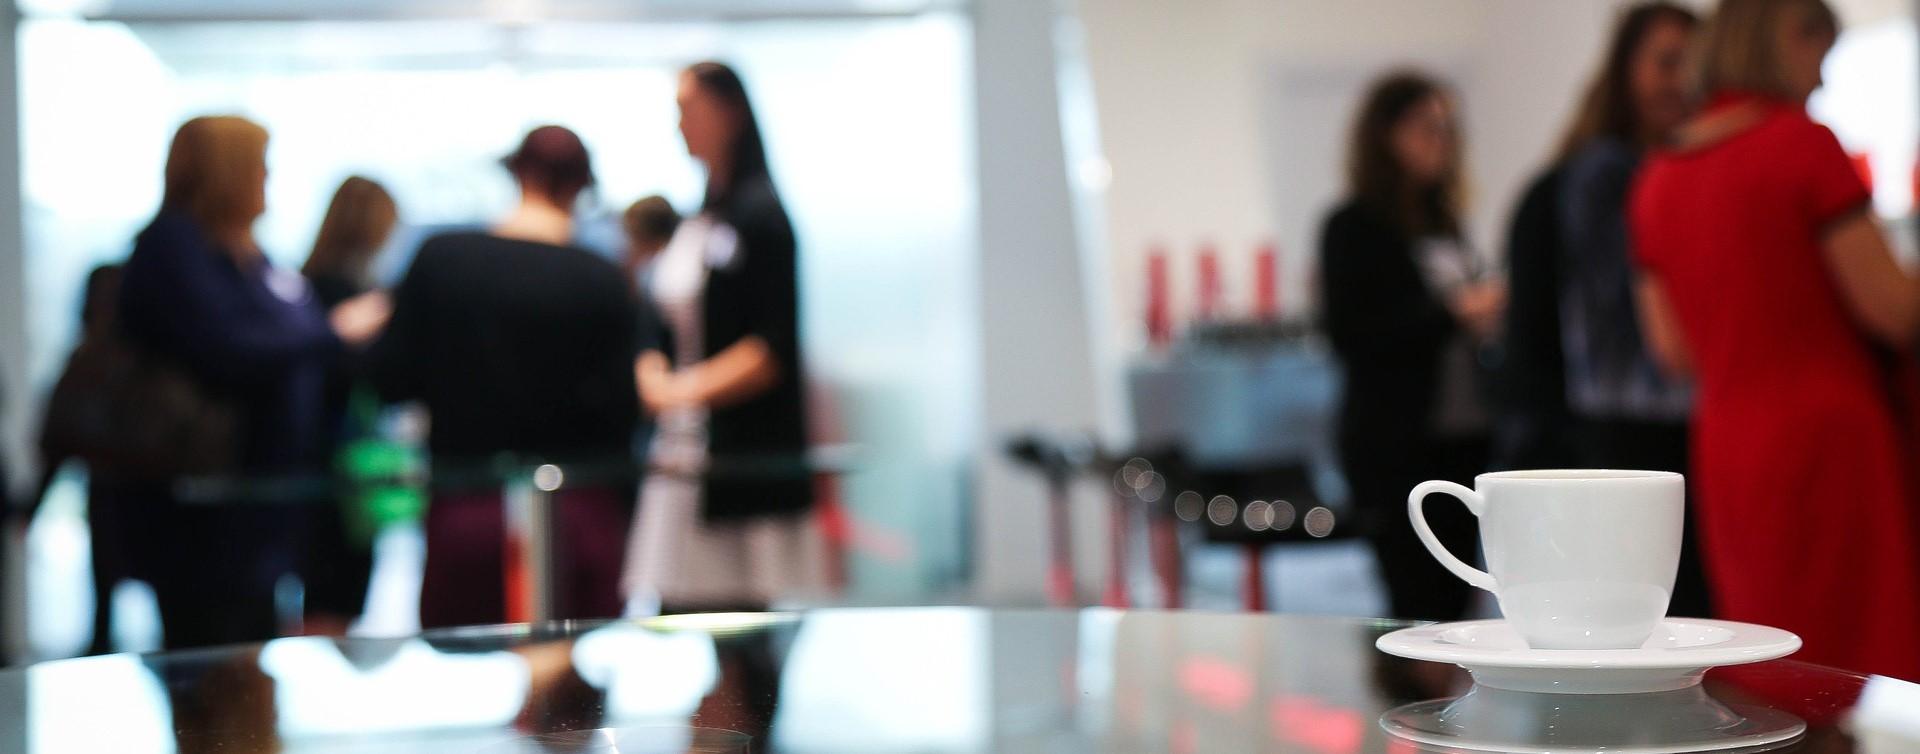 Manufacturers: Your First Inbound Marketing Meeting Agenda [TEMPLATE]